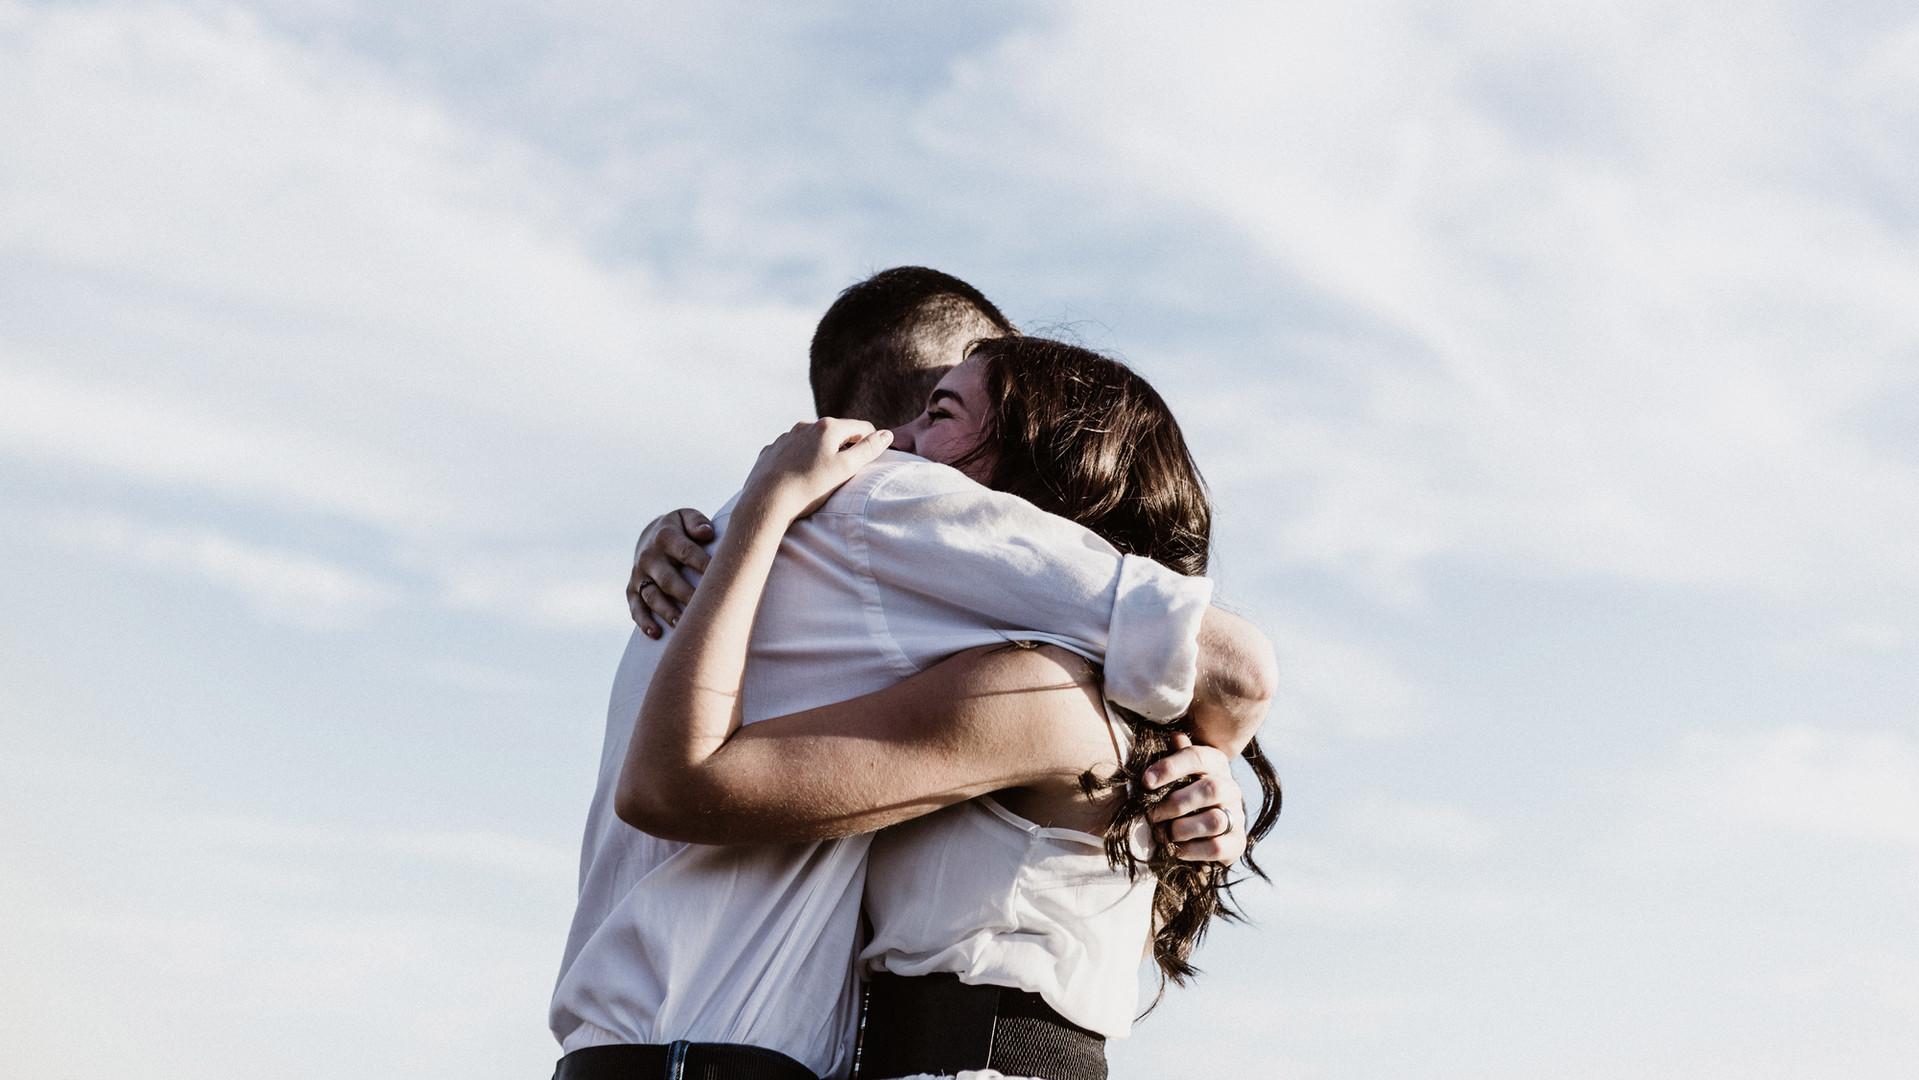 Lovers Hug